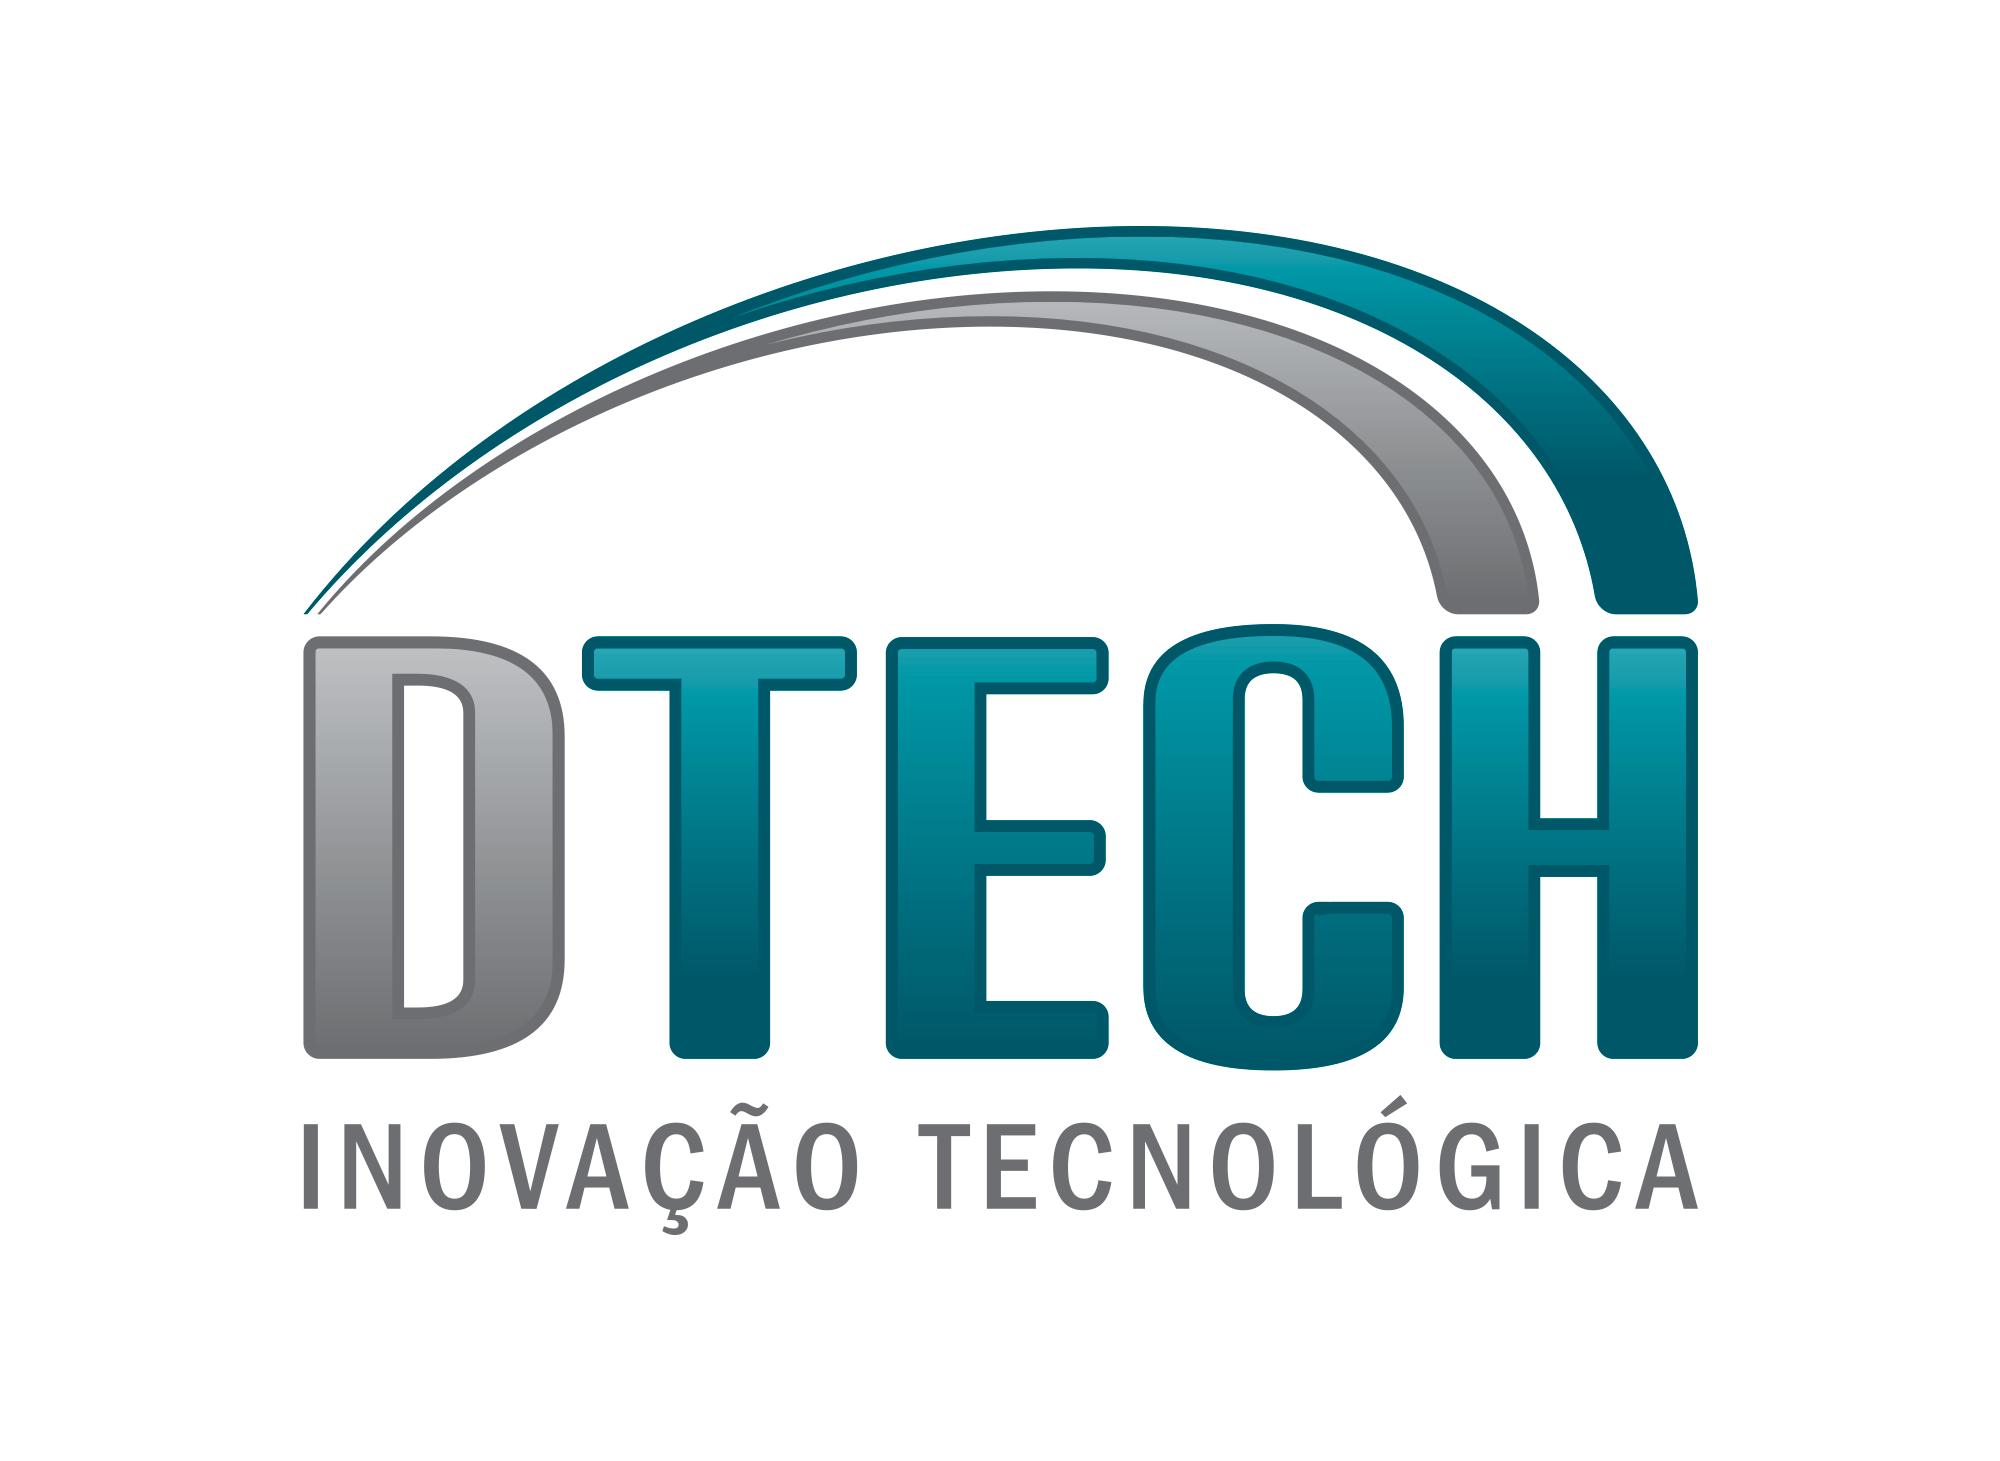 dtech-inovacao-tecnologica-clientes-atendidos-agencia-diretriz-digital-marketing-fortaleza